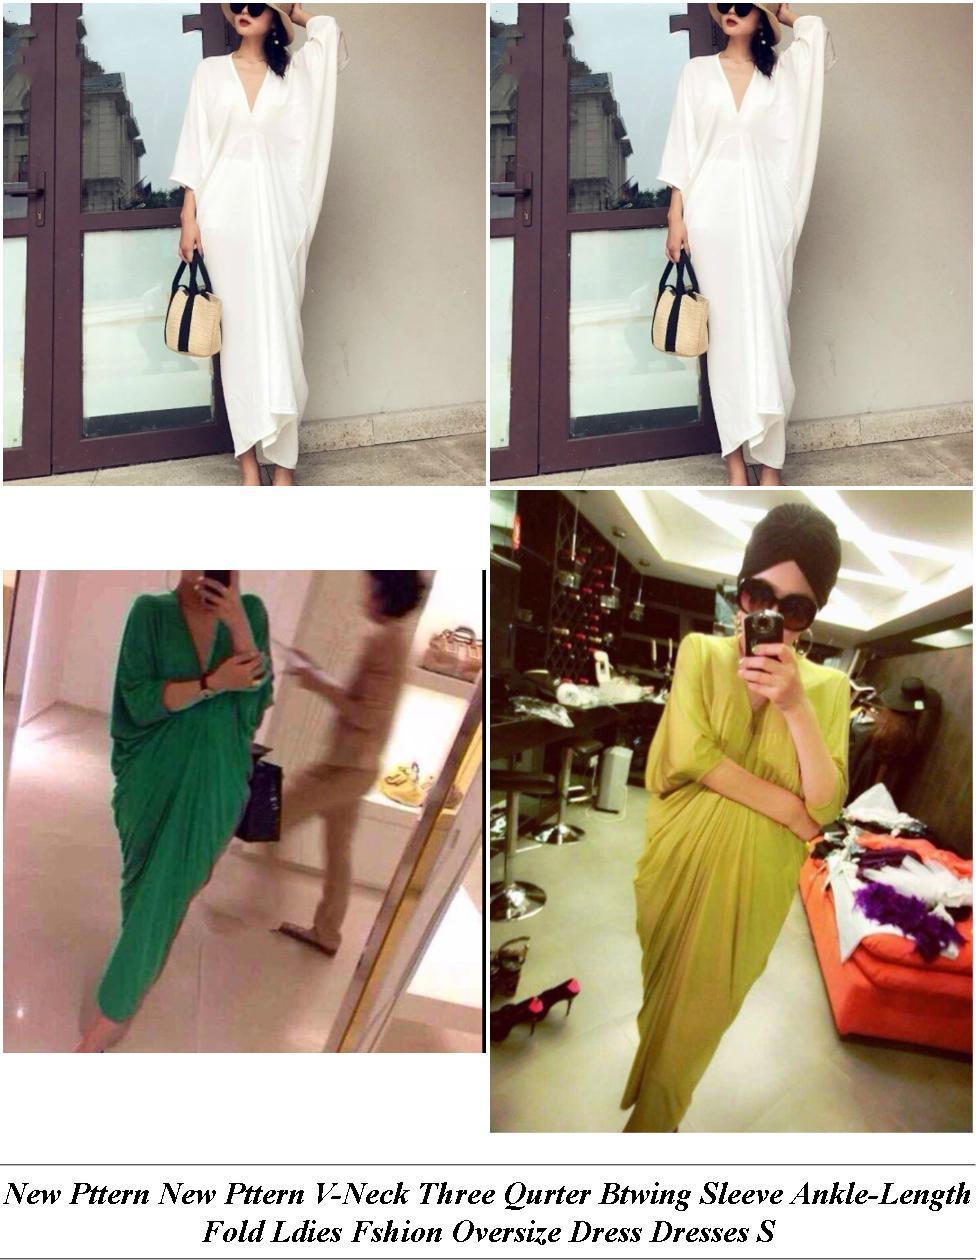 Formal Womens Dresses Online - Sports Shop For Sale Uk - Lack Floral Maxi Dress Canada